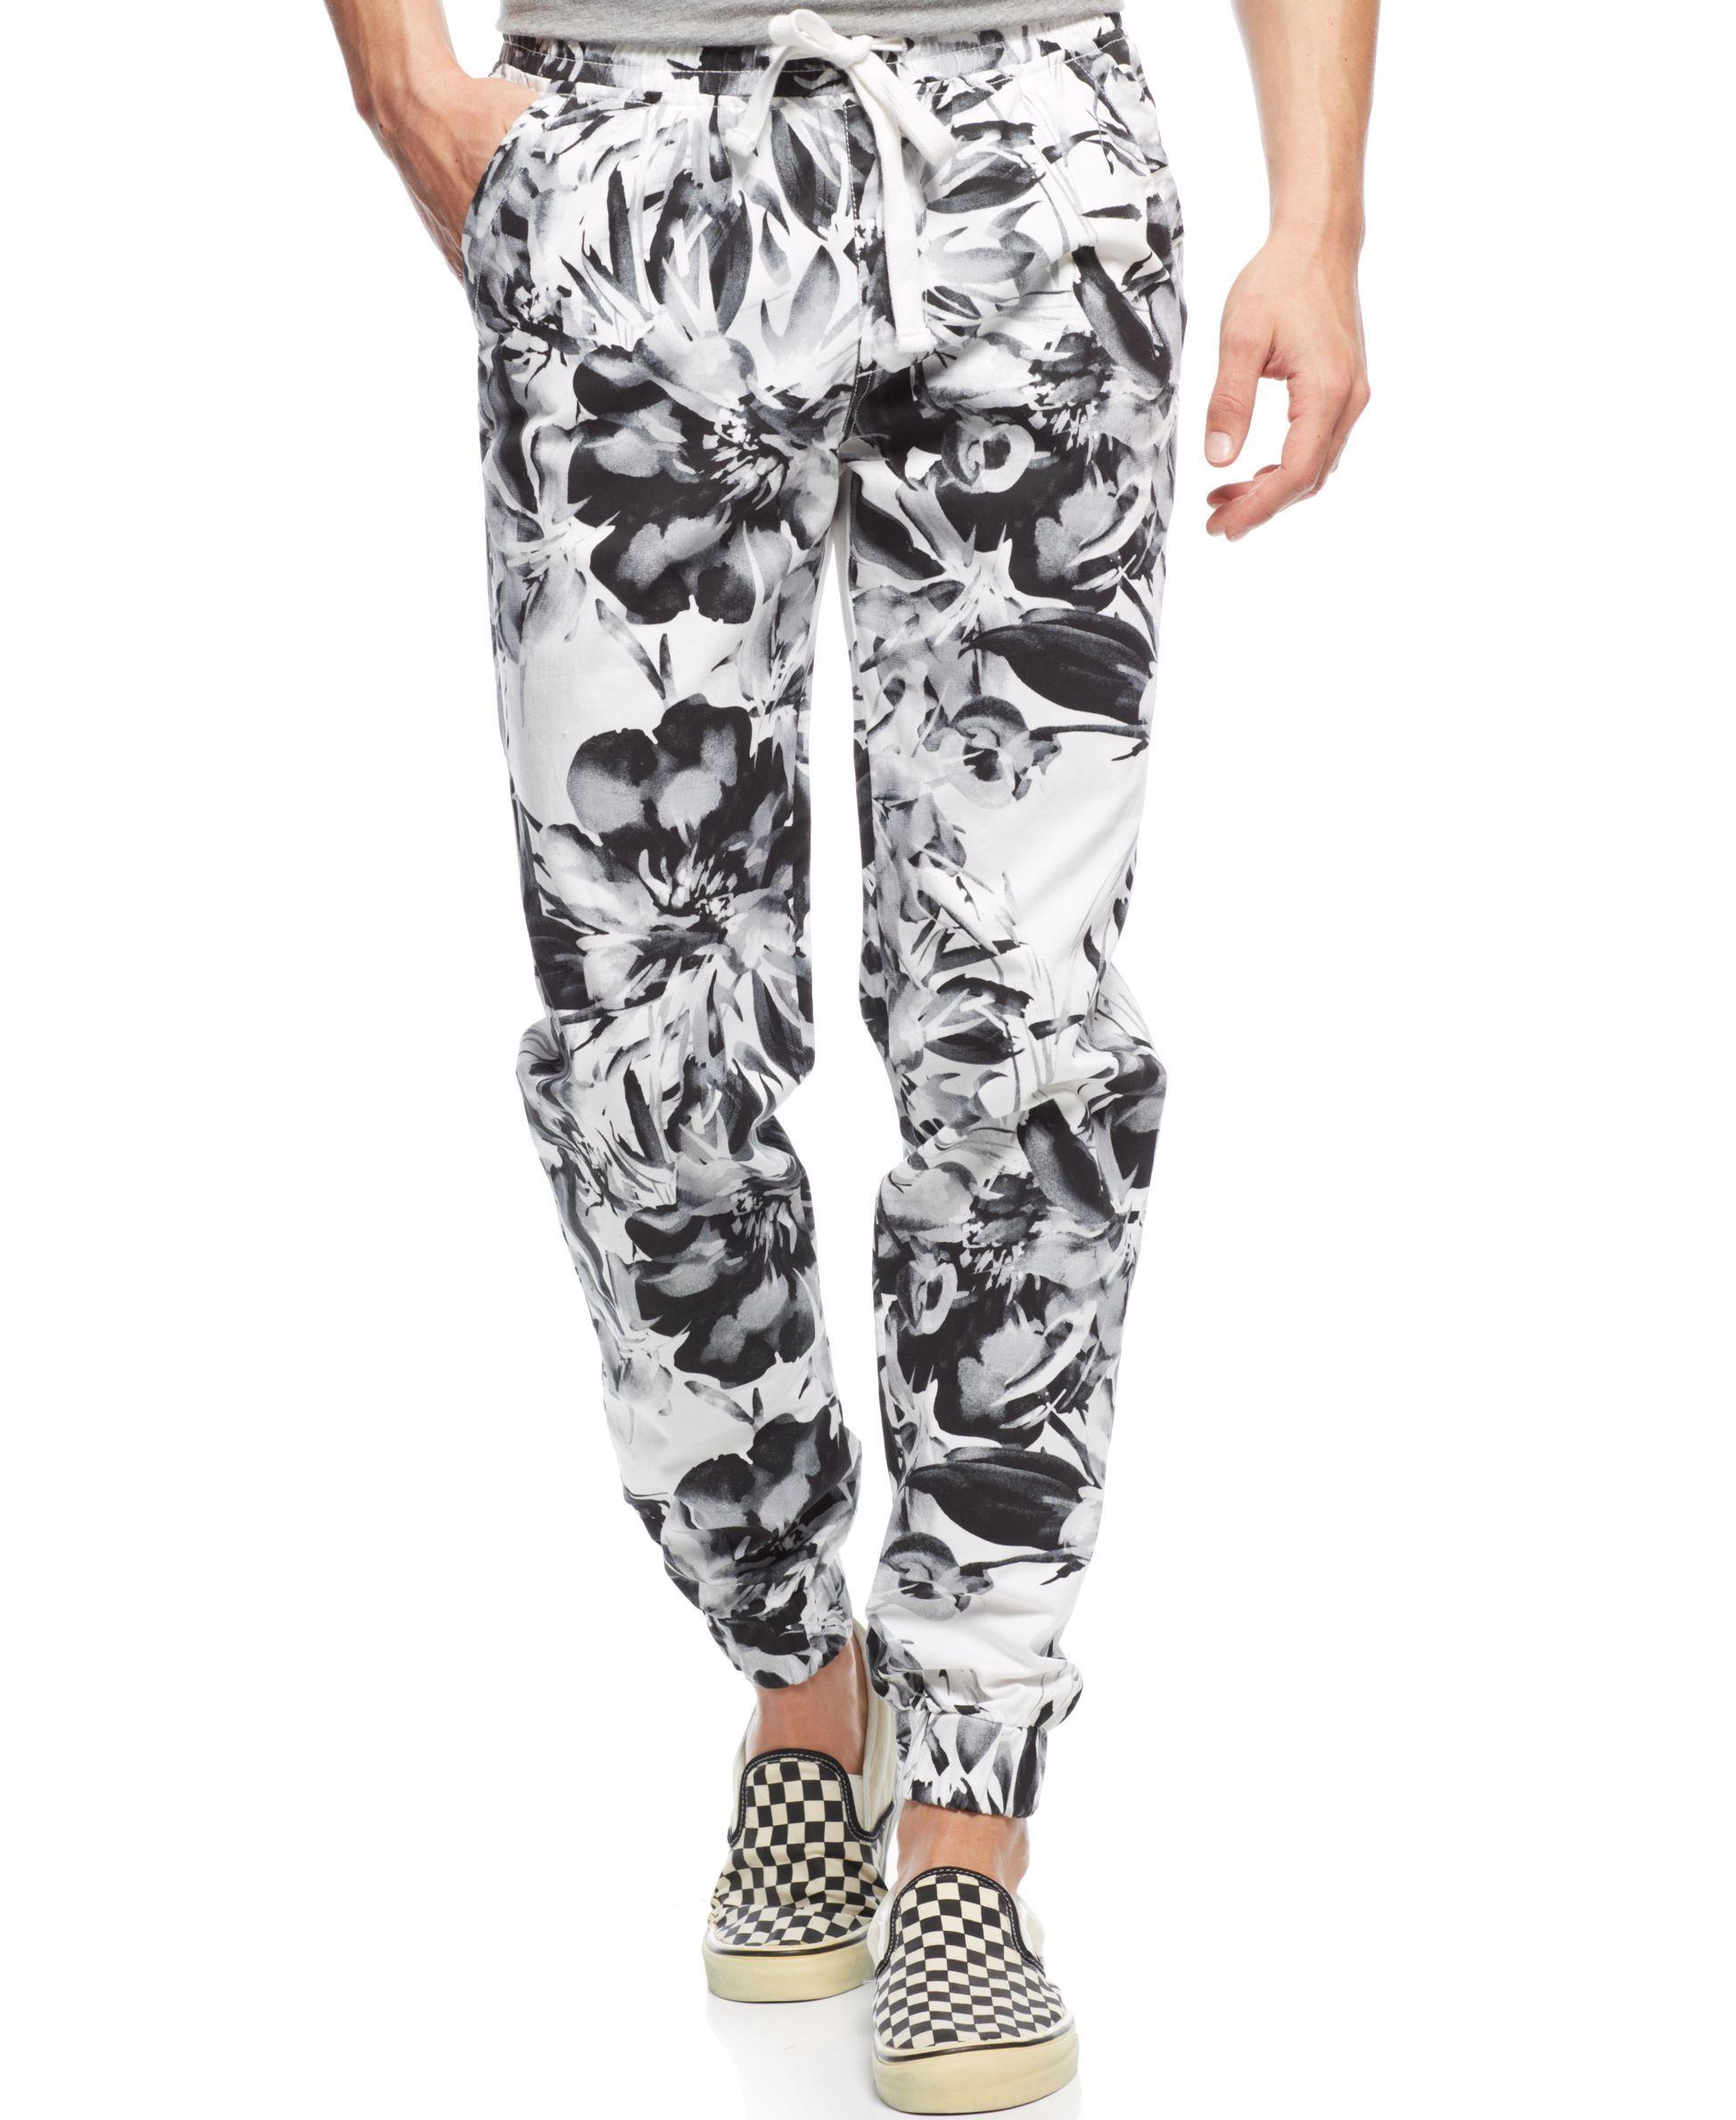 Trukfit Drawstring Floral Joggers Floral Joggers Joggers Pants